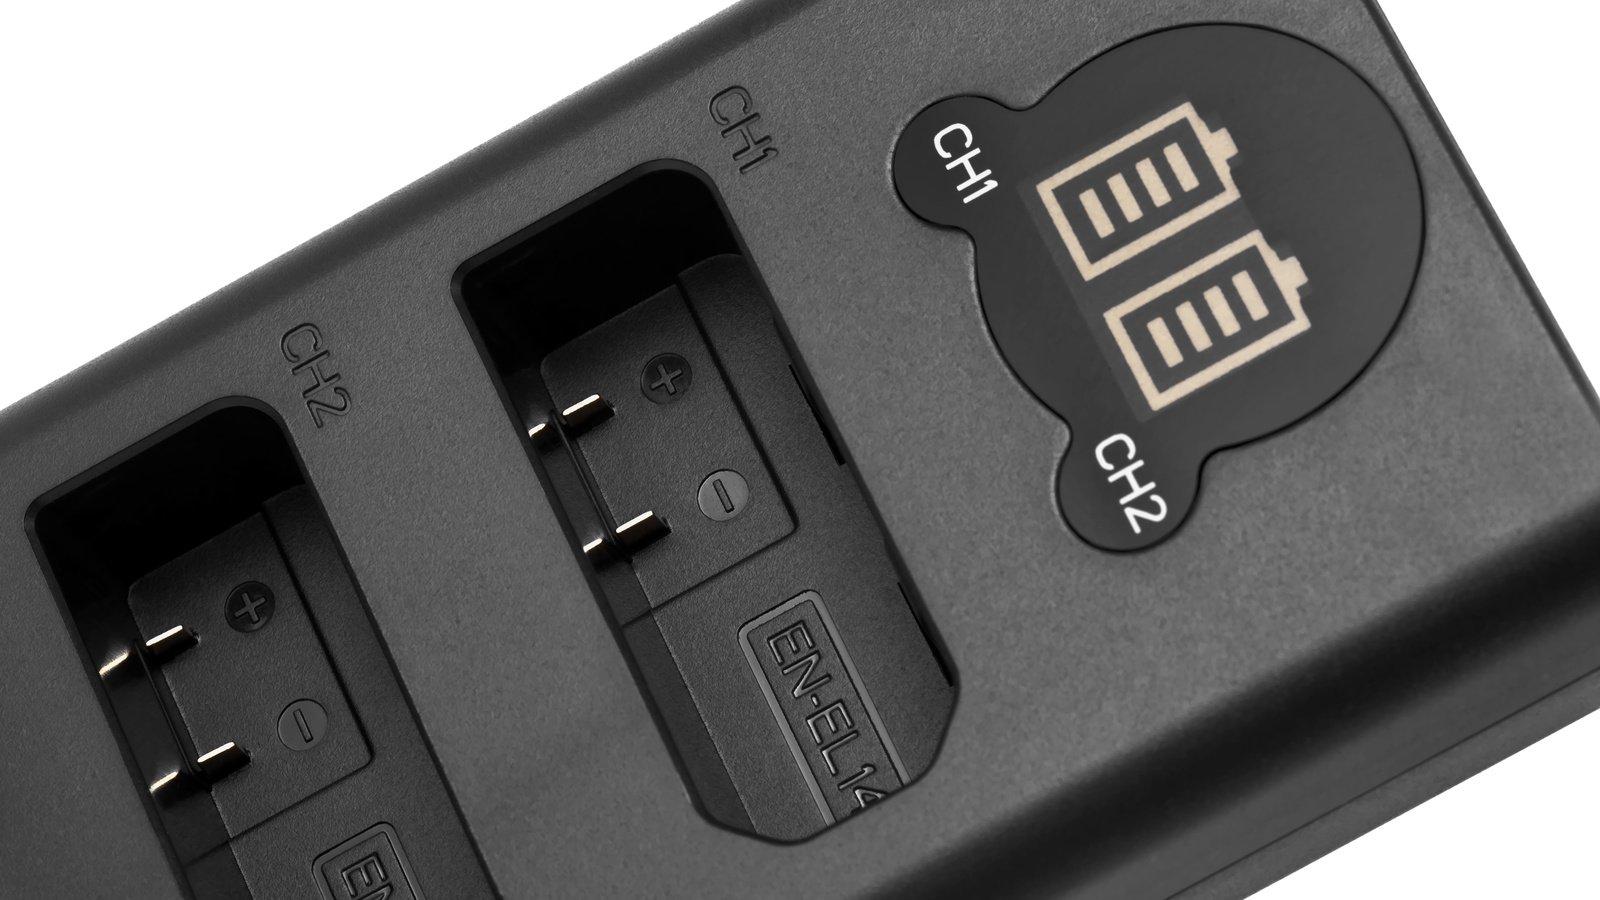 ROKO TCU2-EL14 Doppel-Ladegerät mit USB für Nikon EN-EL14 Akkus Foto Nr. 1